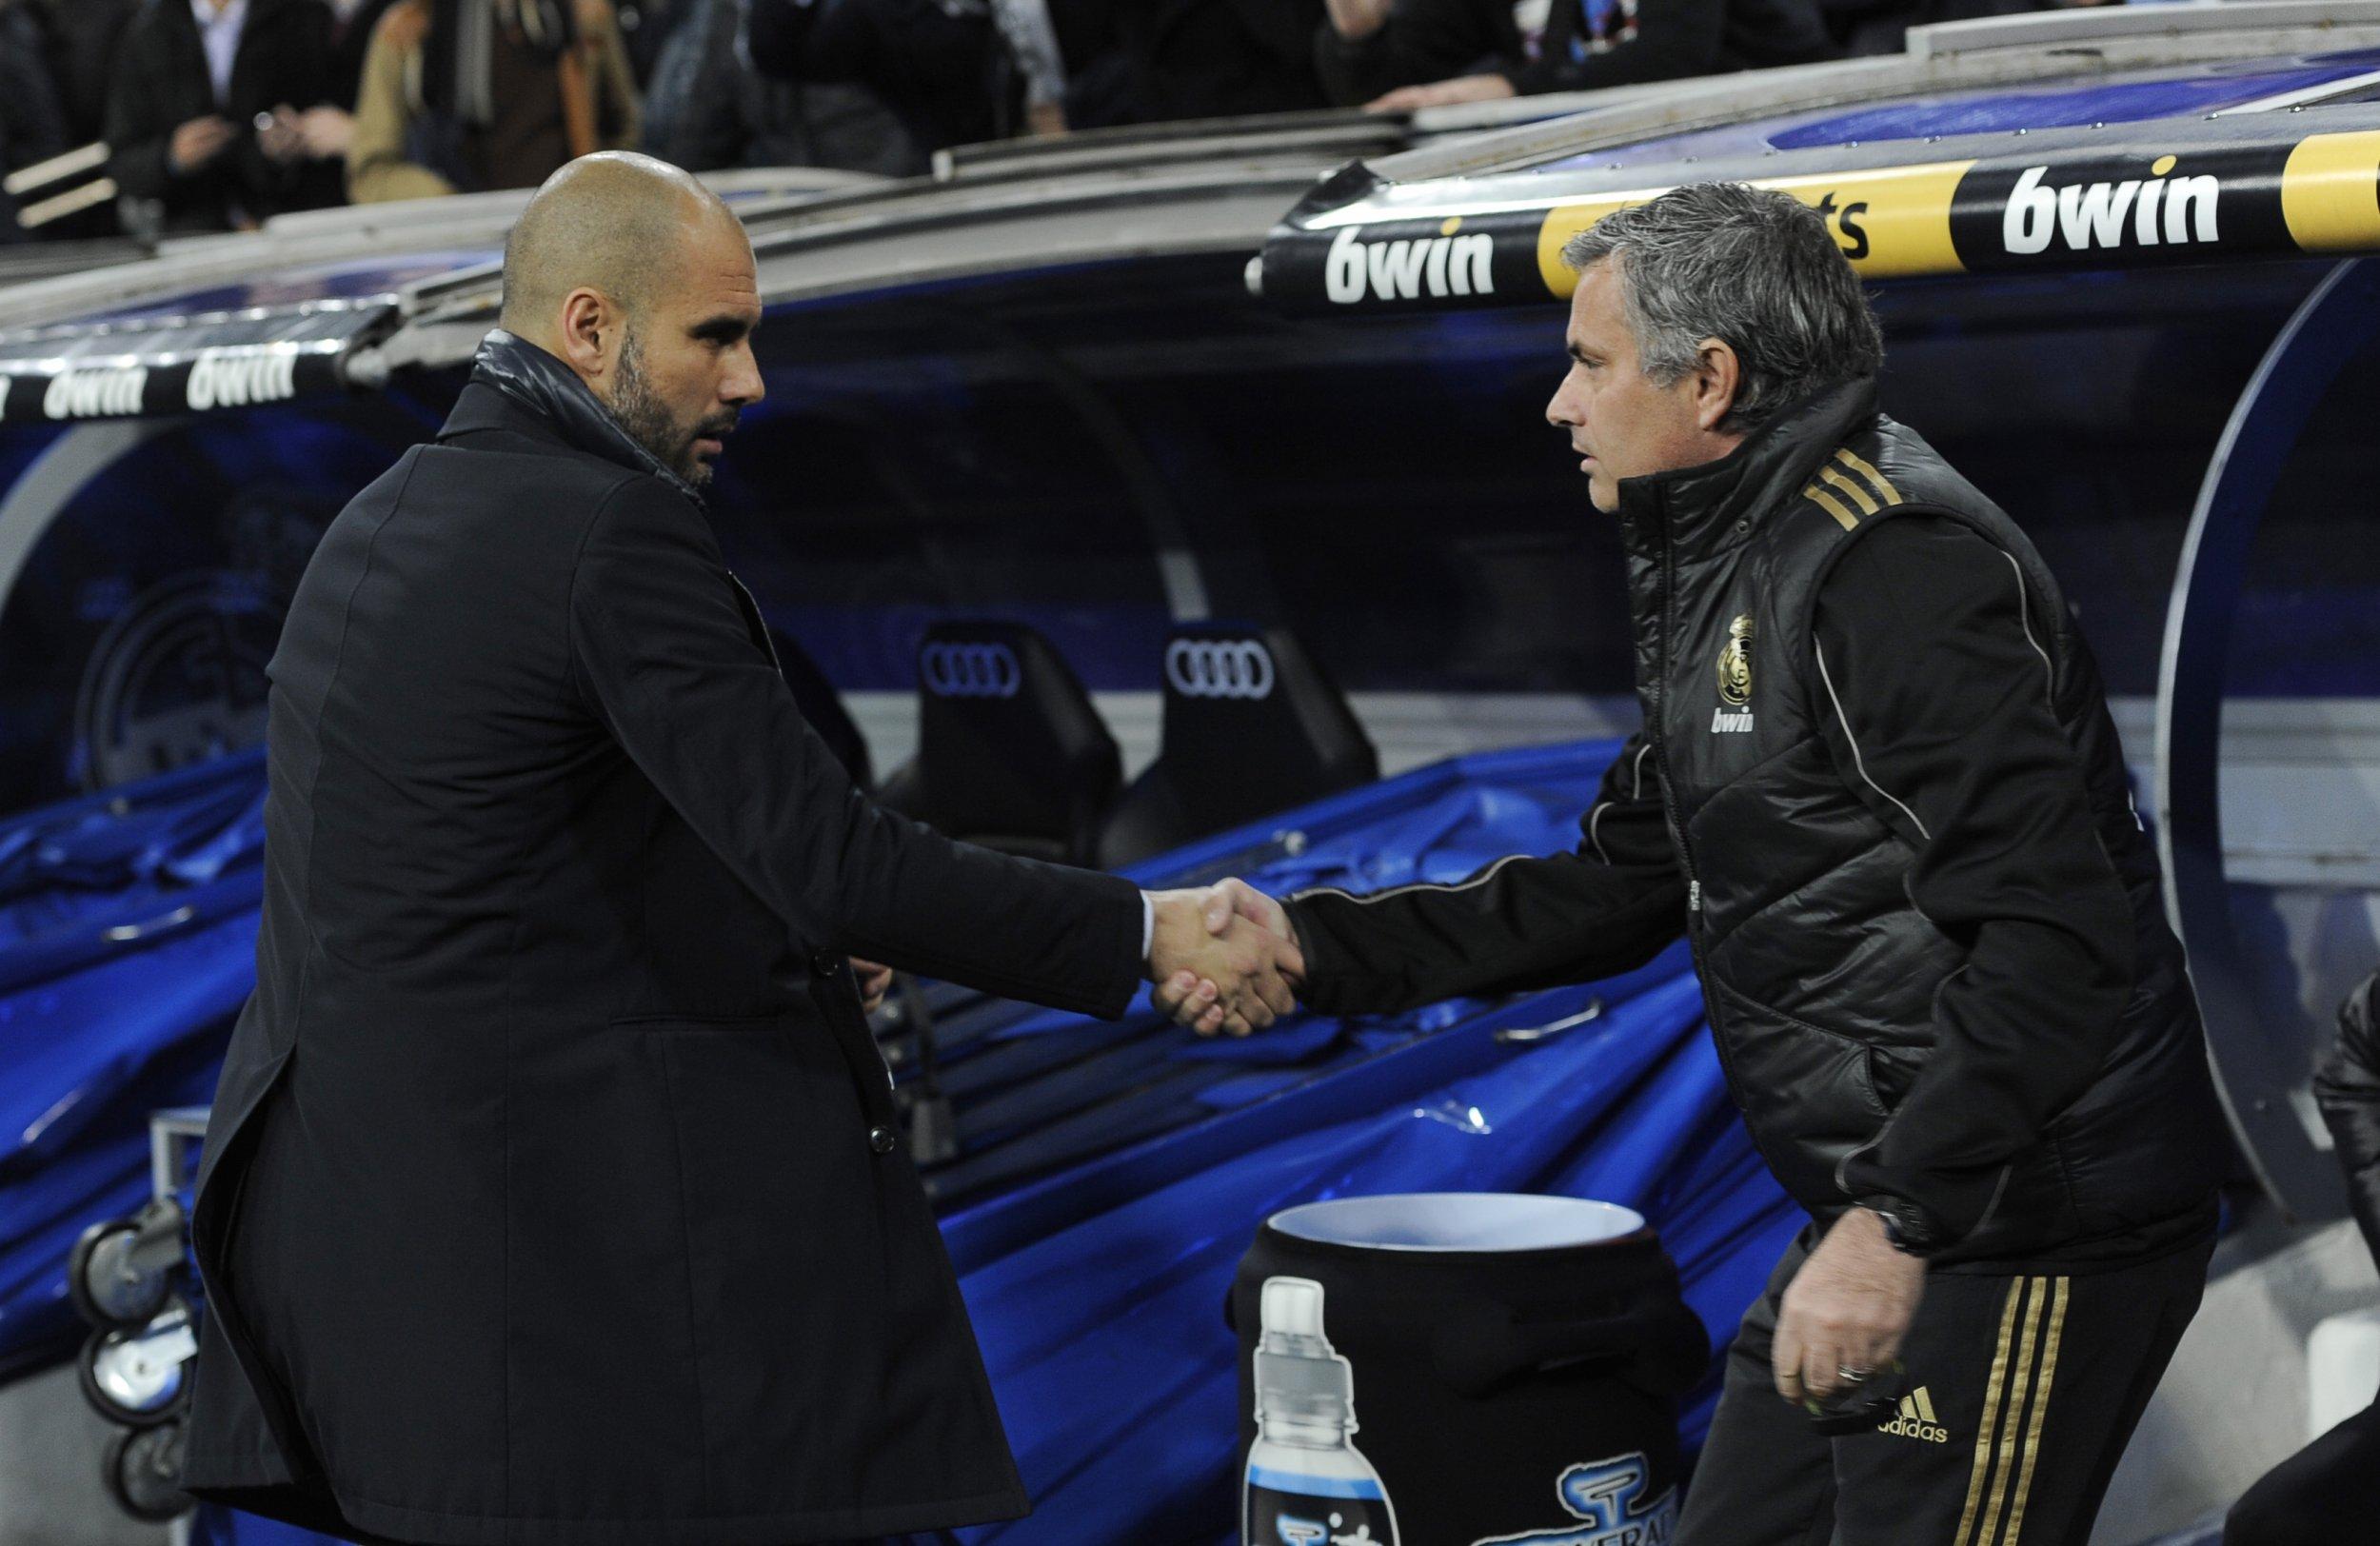 Jose Mourinho, right, and Pep Guardiola